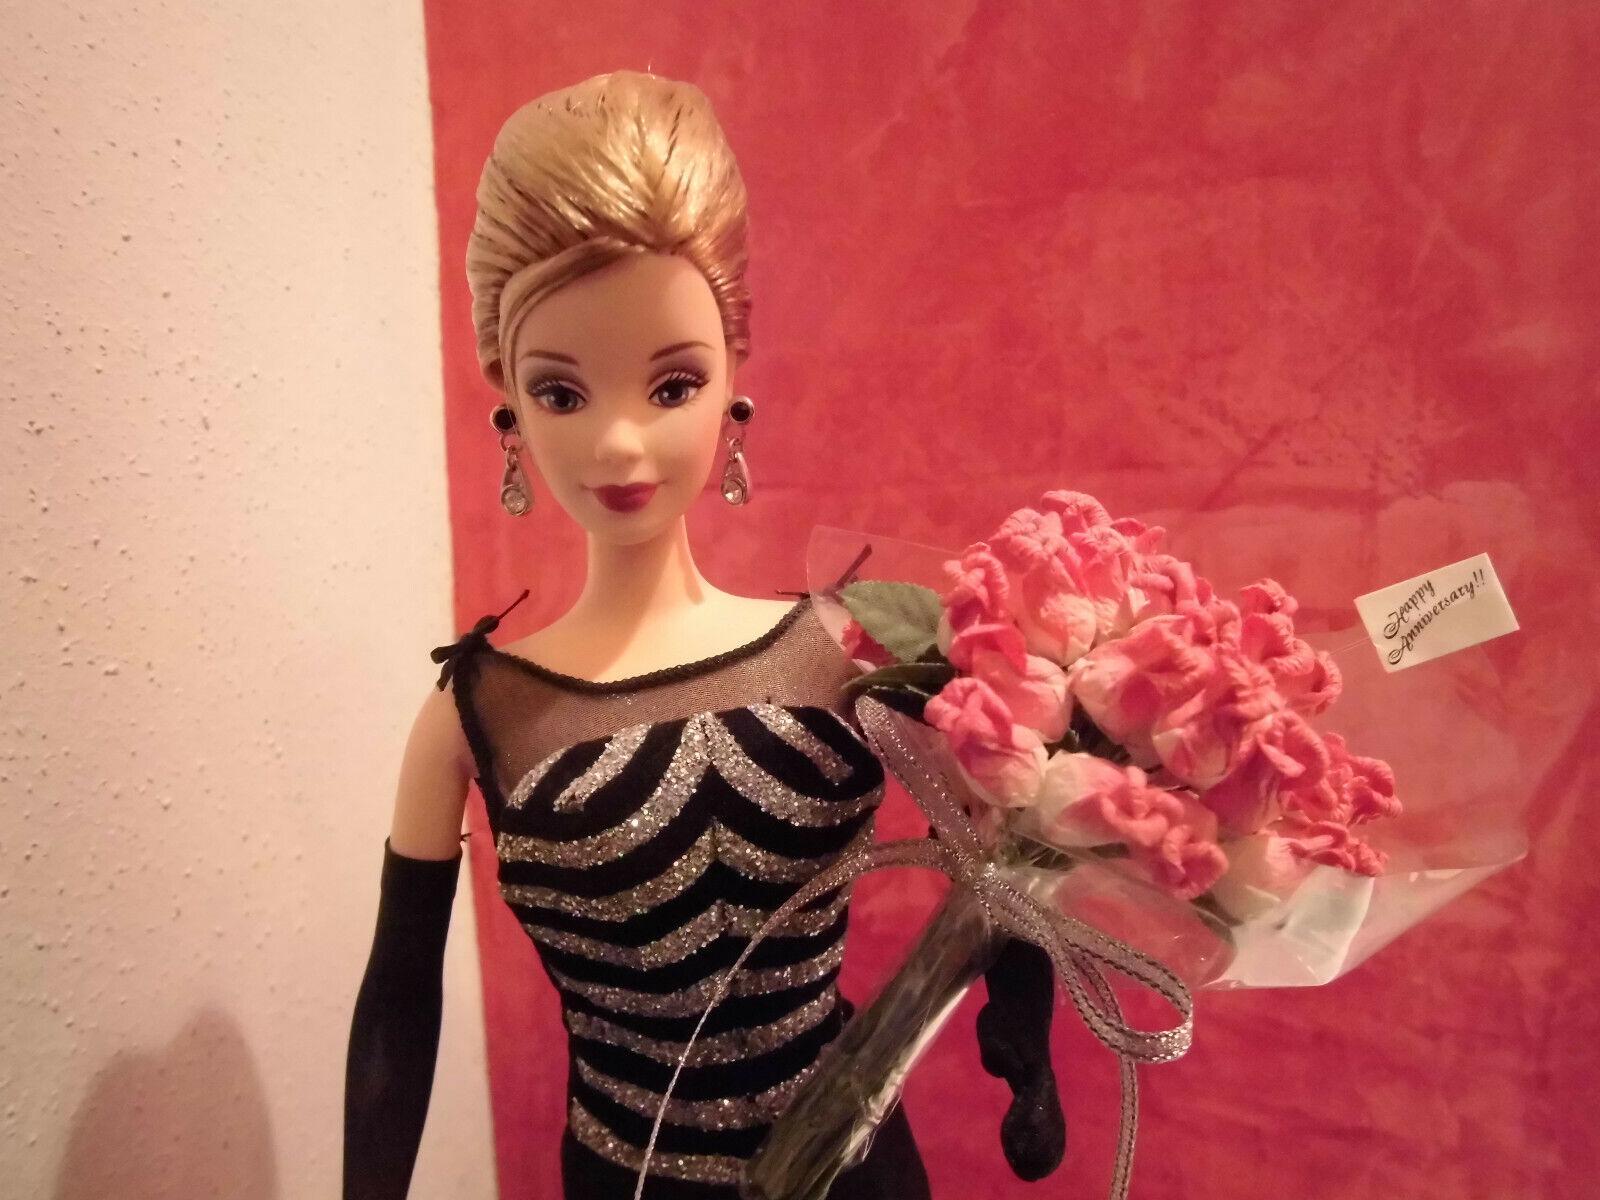 40th Anniversary Barbie + Steiff Teddy Bär Nr. 381 Limited Ed. 1999, Collector